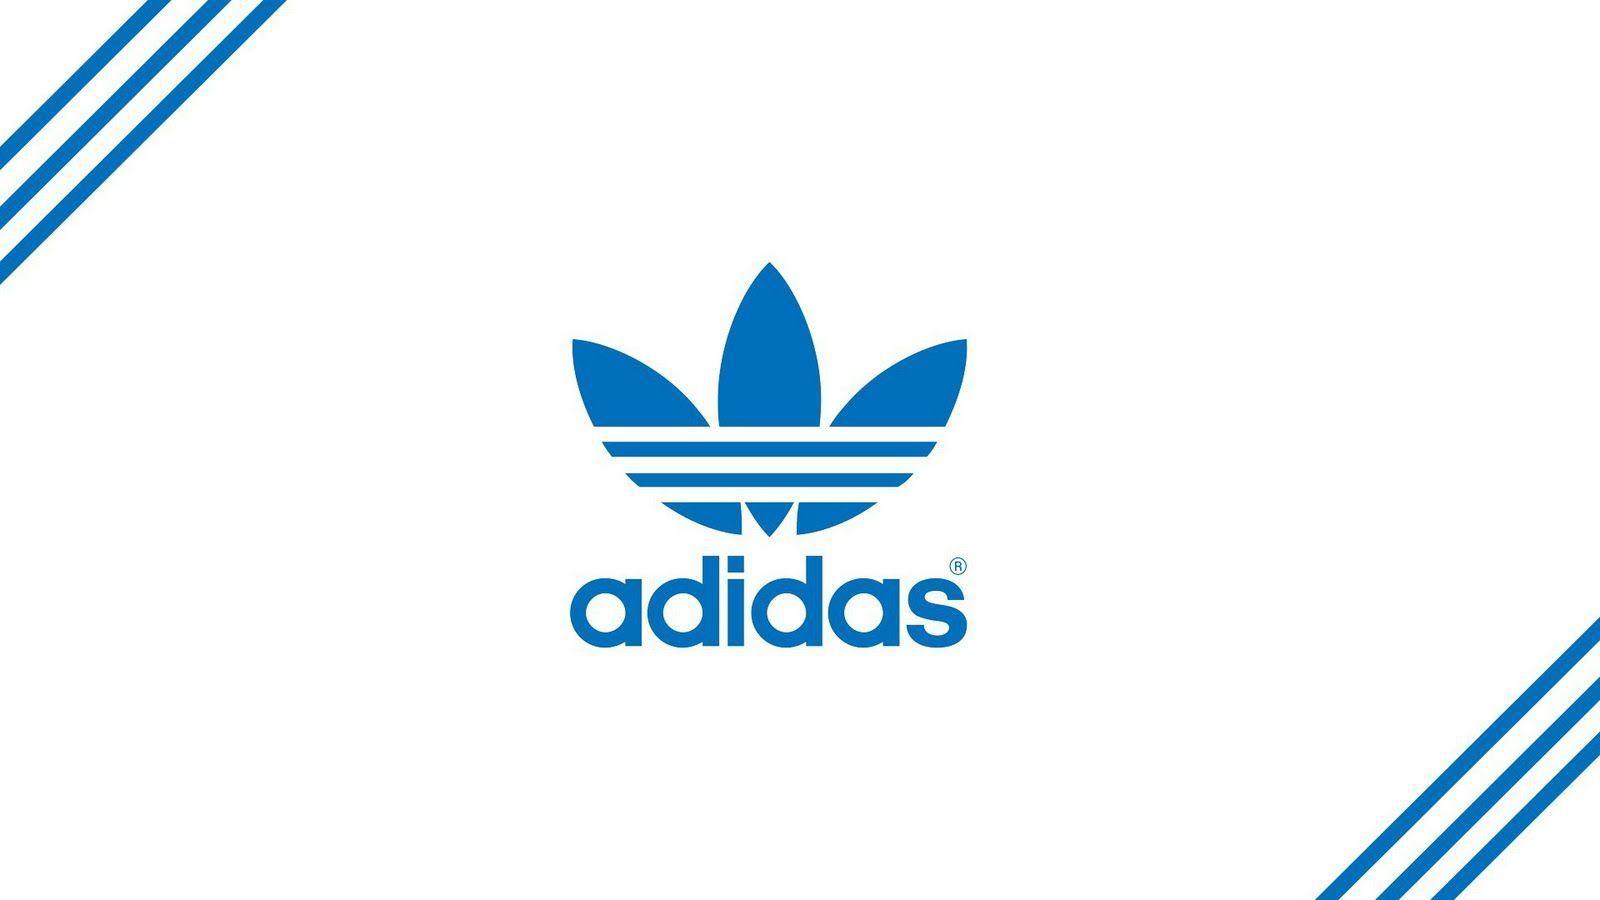 Logo Adidas Wallpapers 1600x900